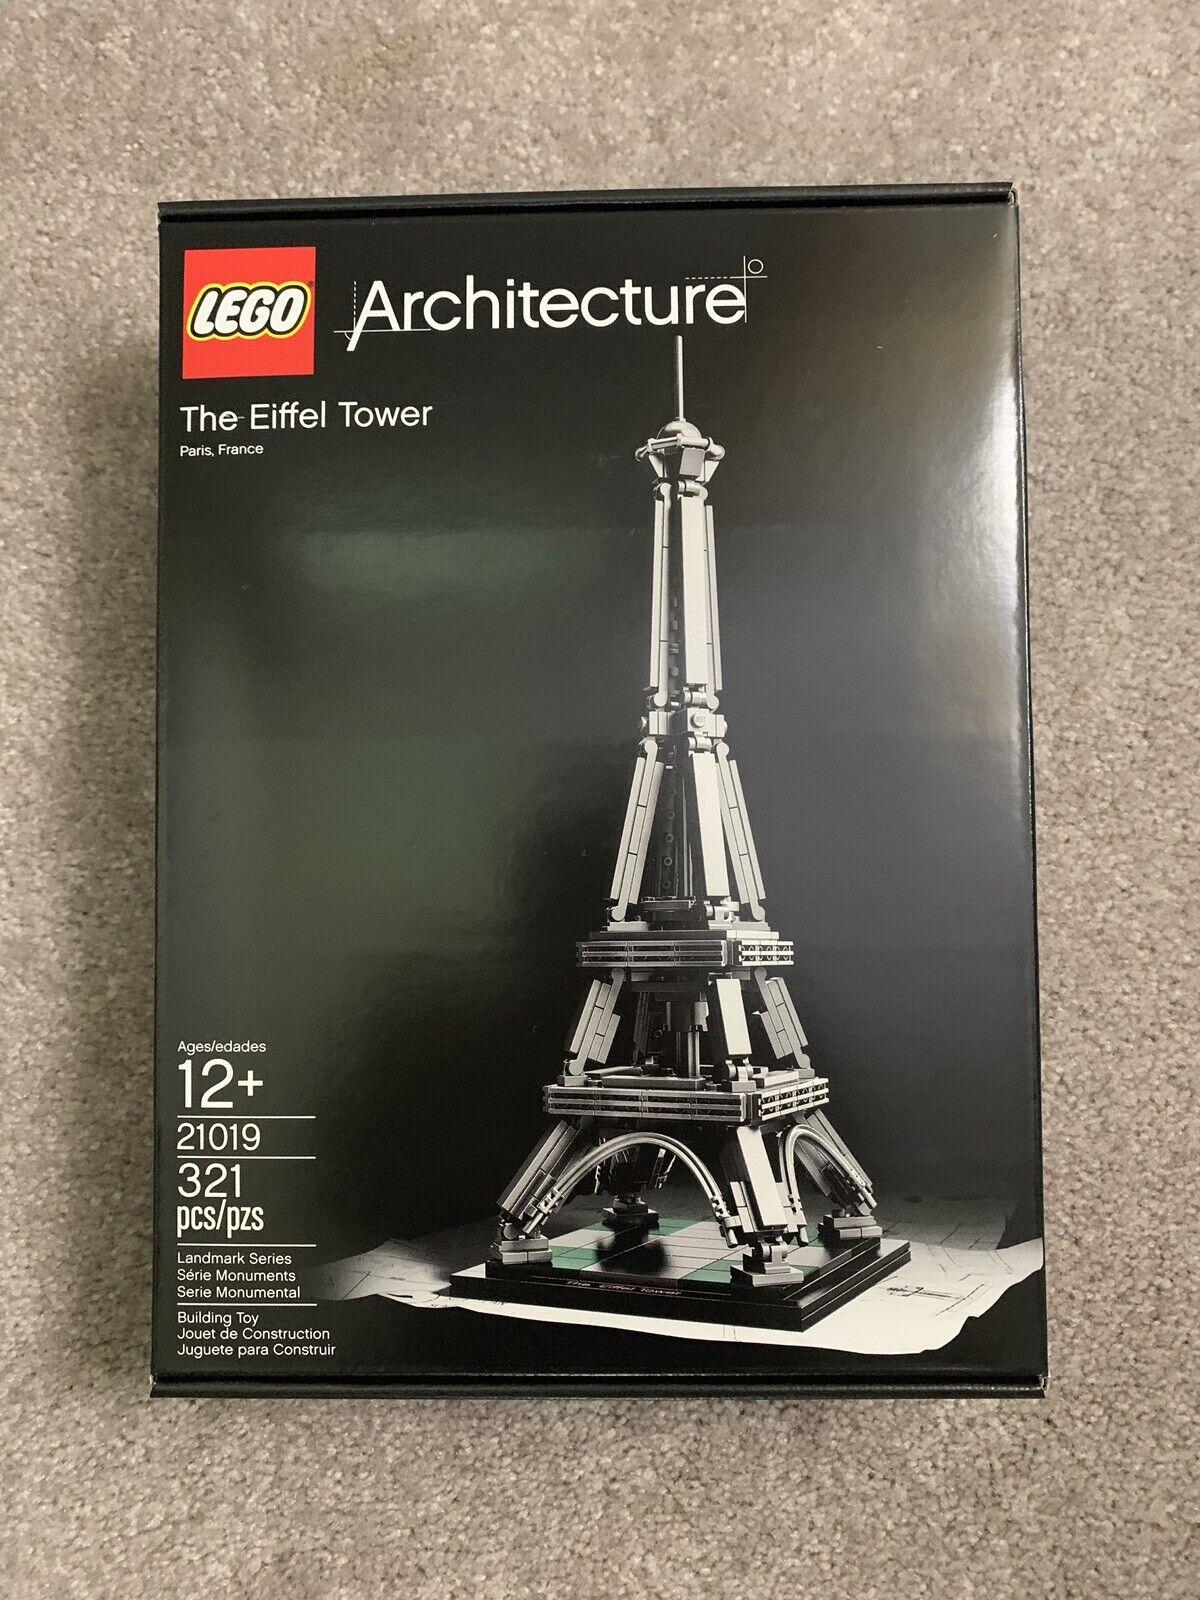 Ages 12+ 321 PCS LEGO Architecture Eiffel Tower 2014 French Landmark 21019